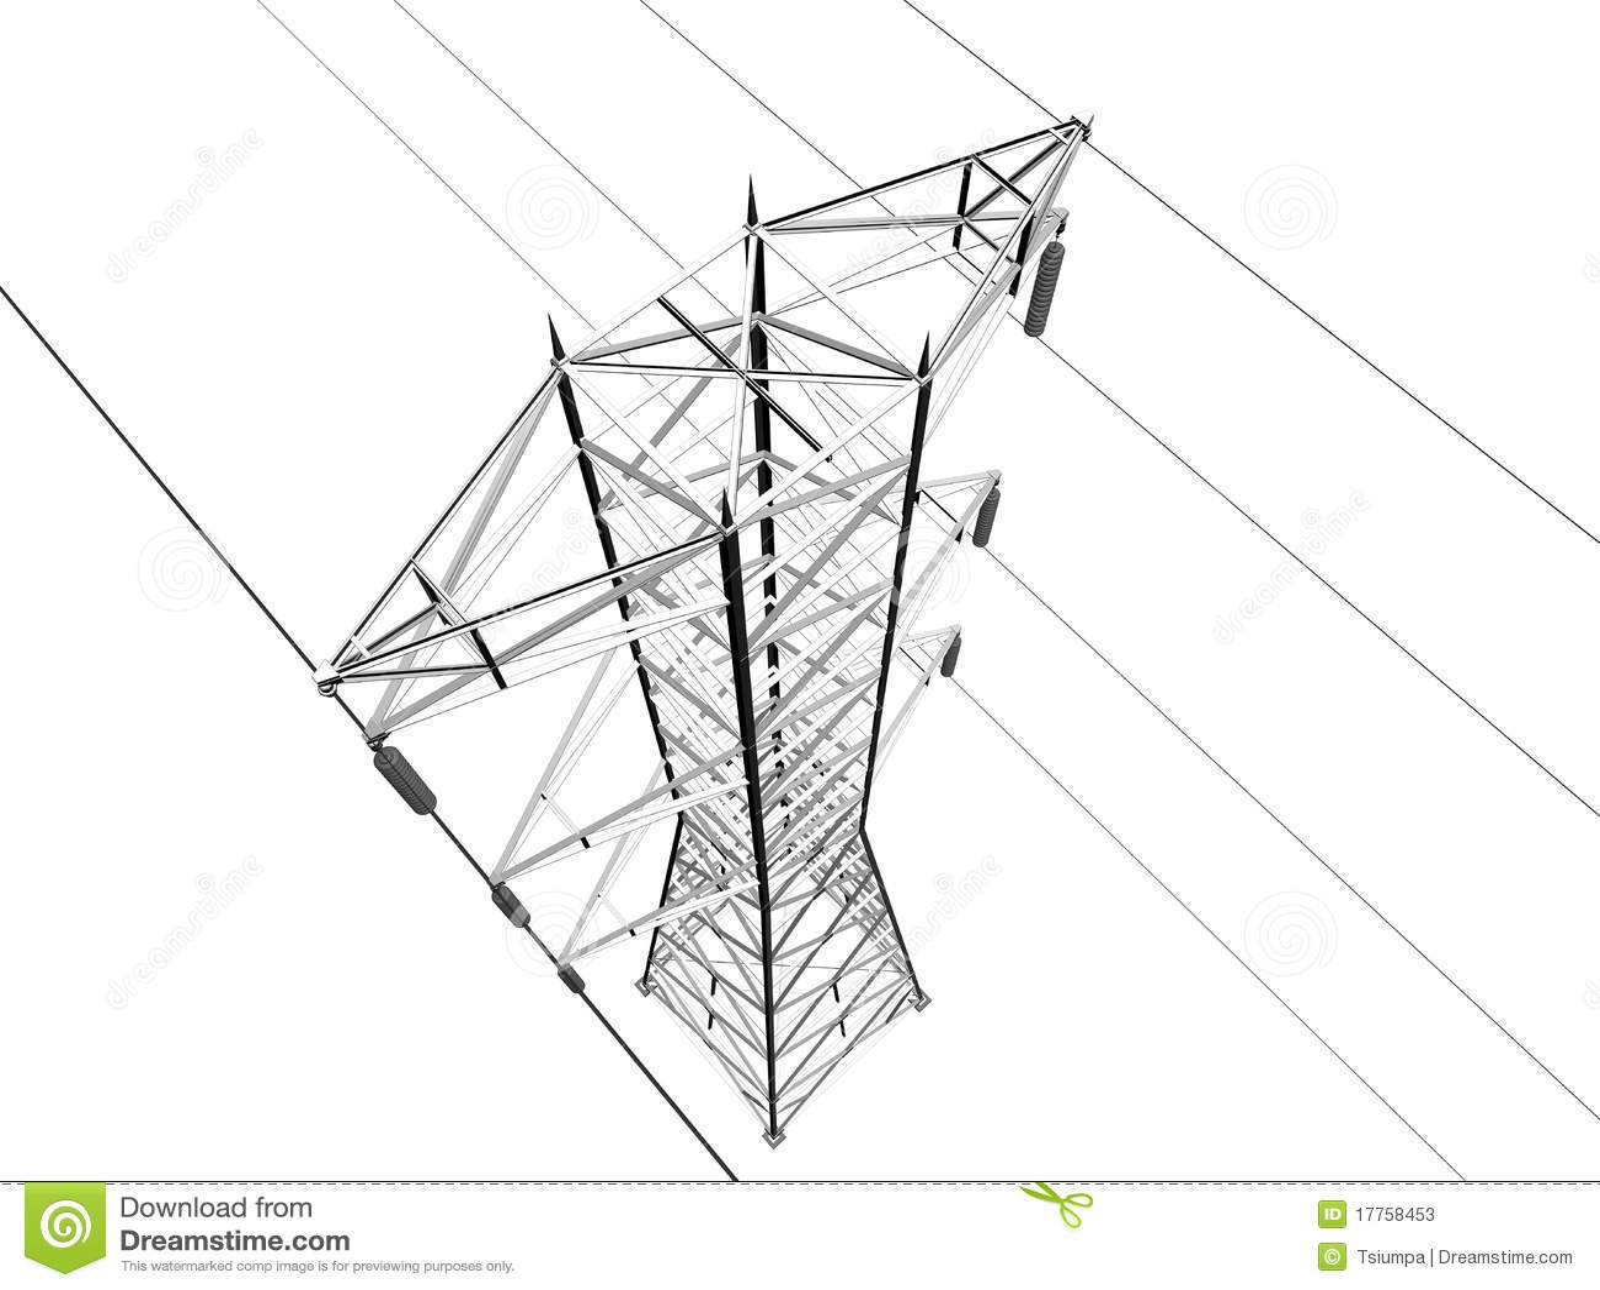 Electric Transmission Line Stock Illustration